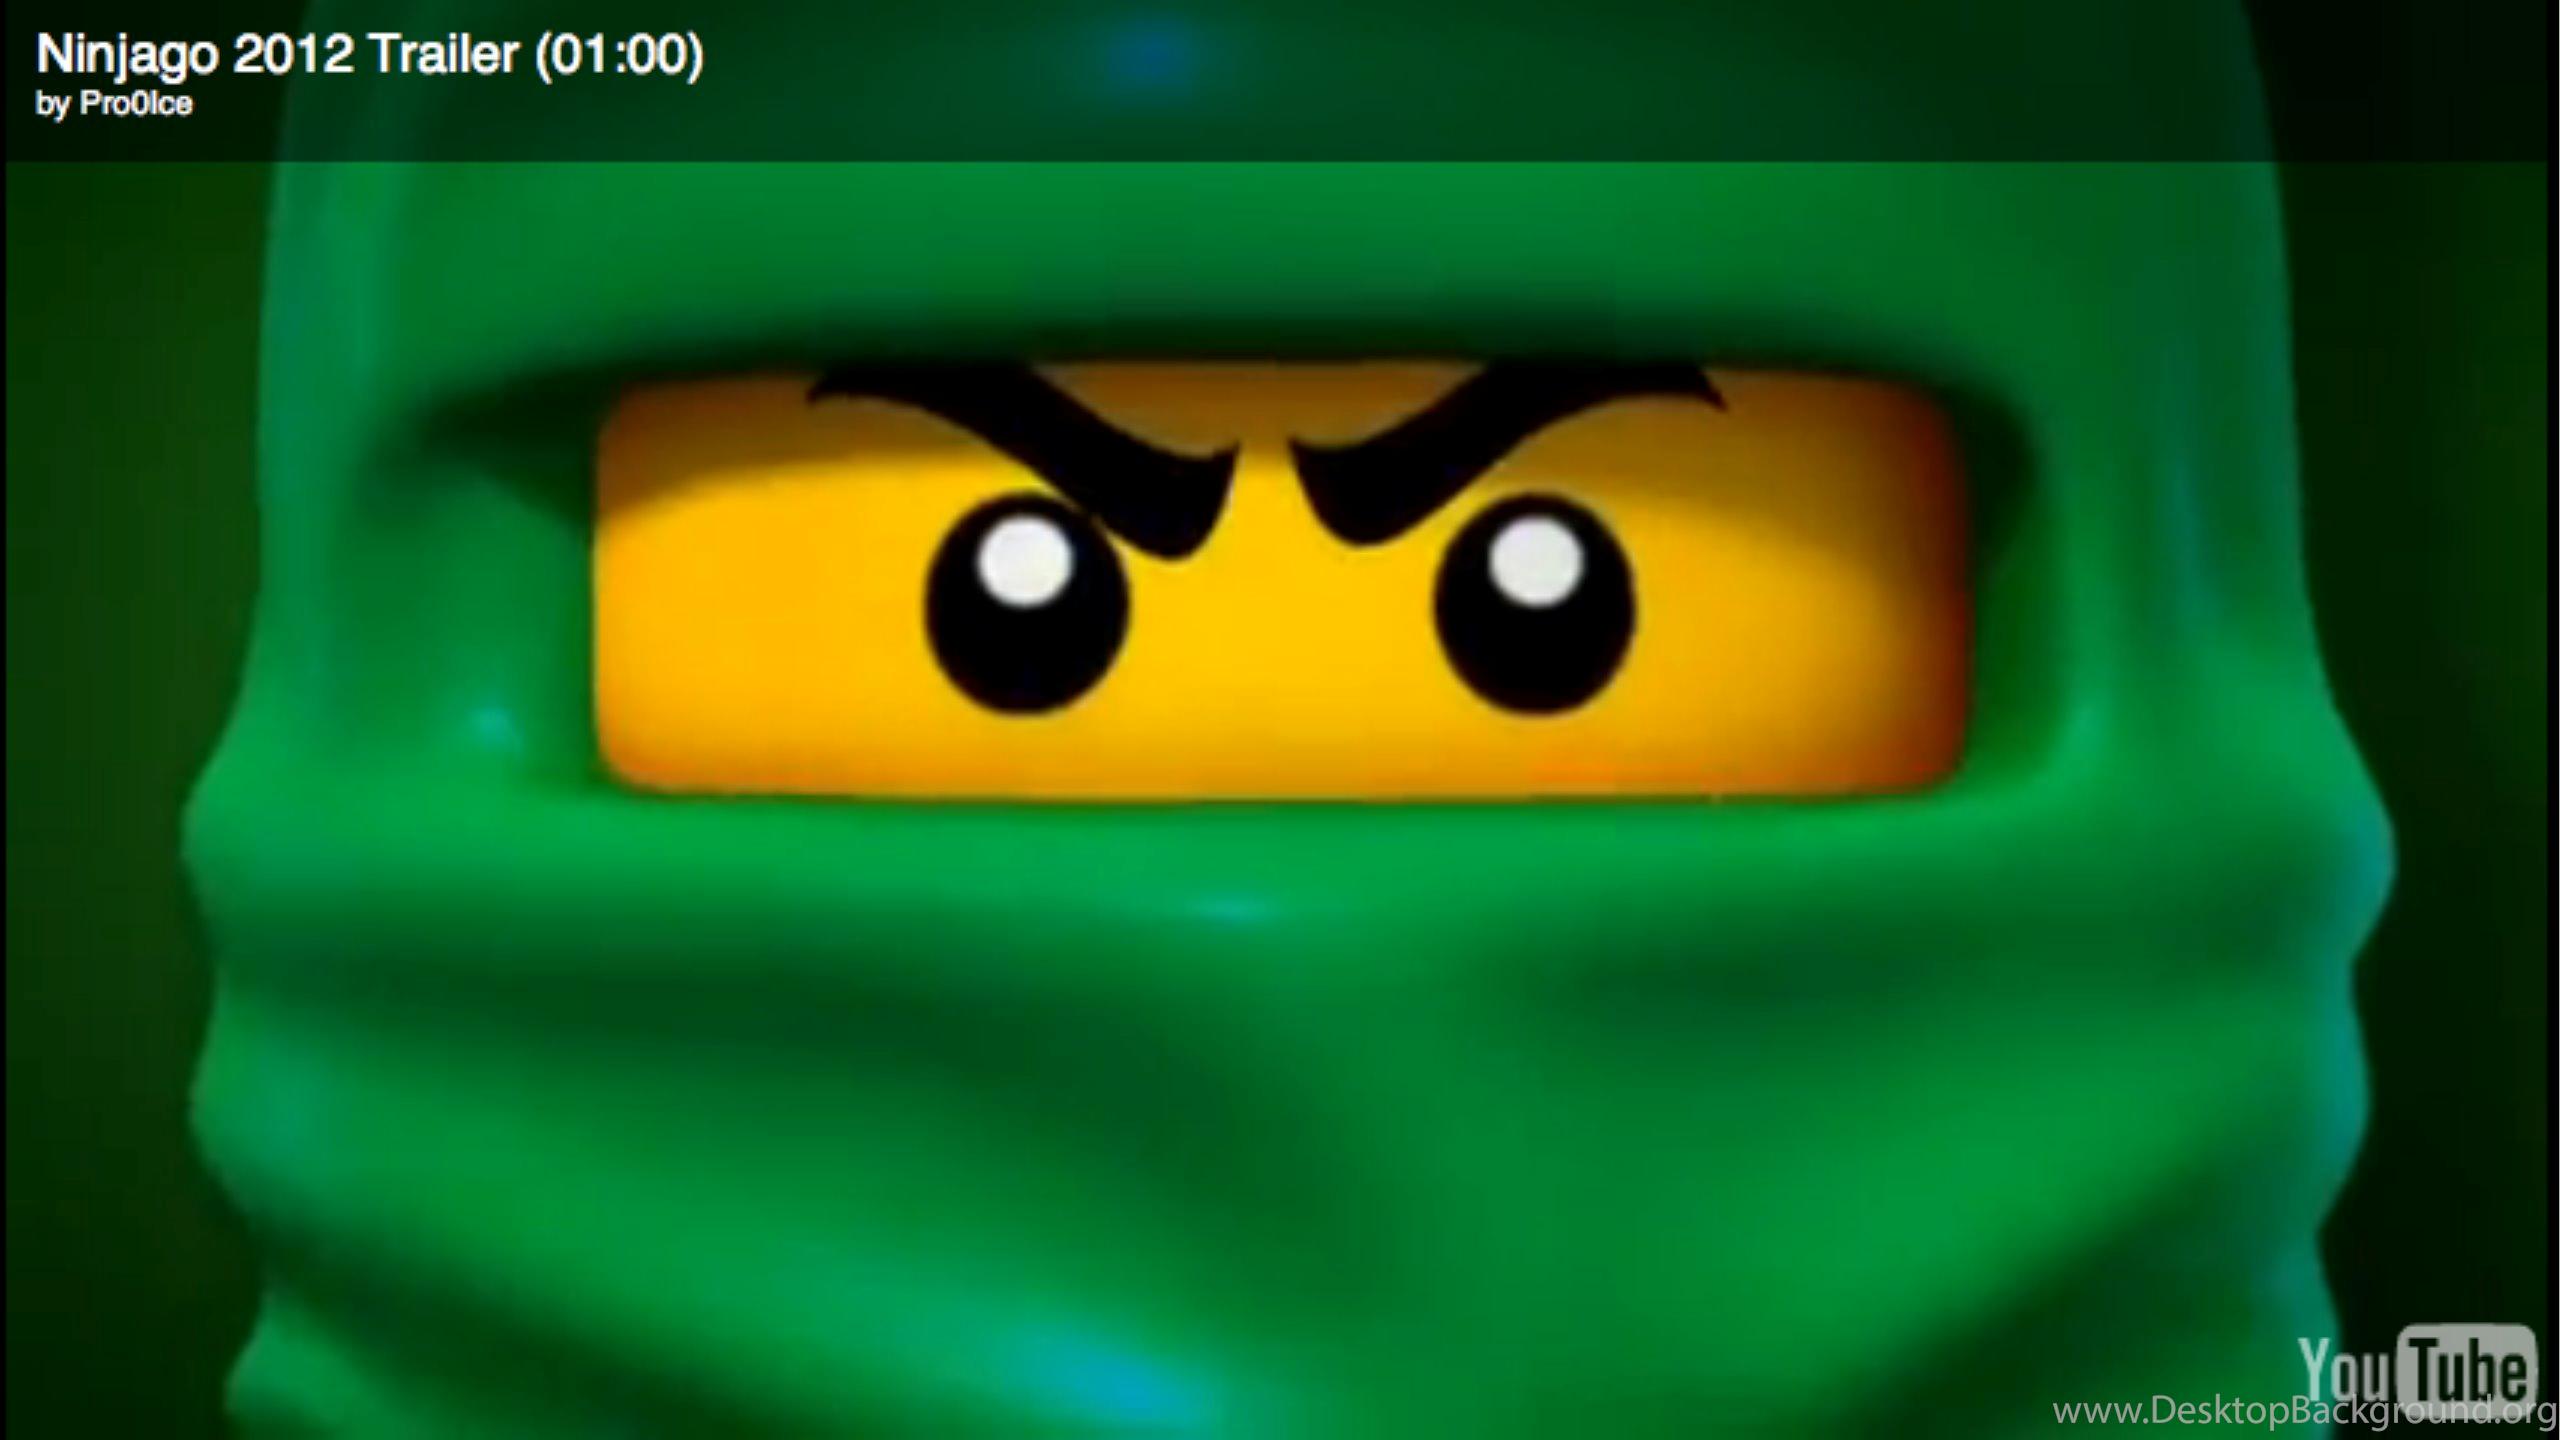 Wallpapers Lego Ninjago Lord Garmadon 1280x800 Desktop Background